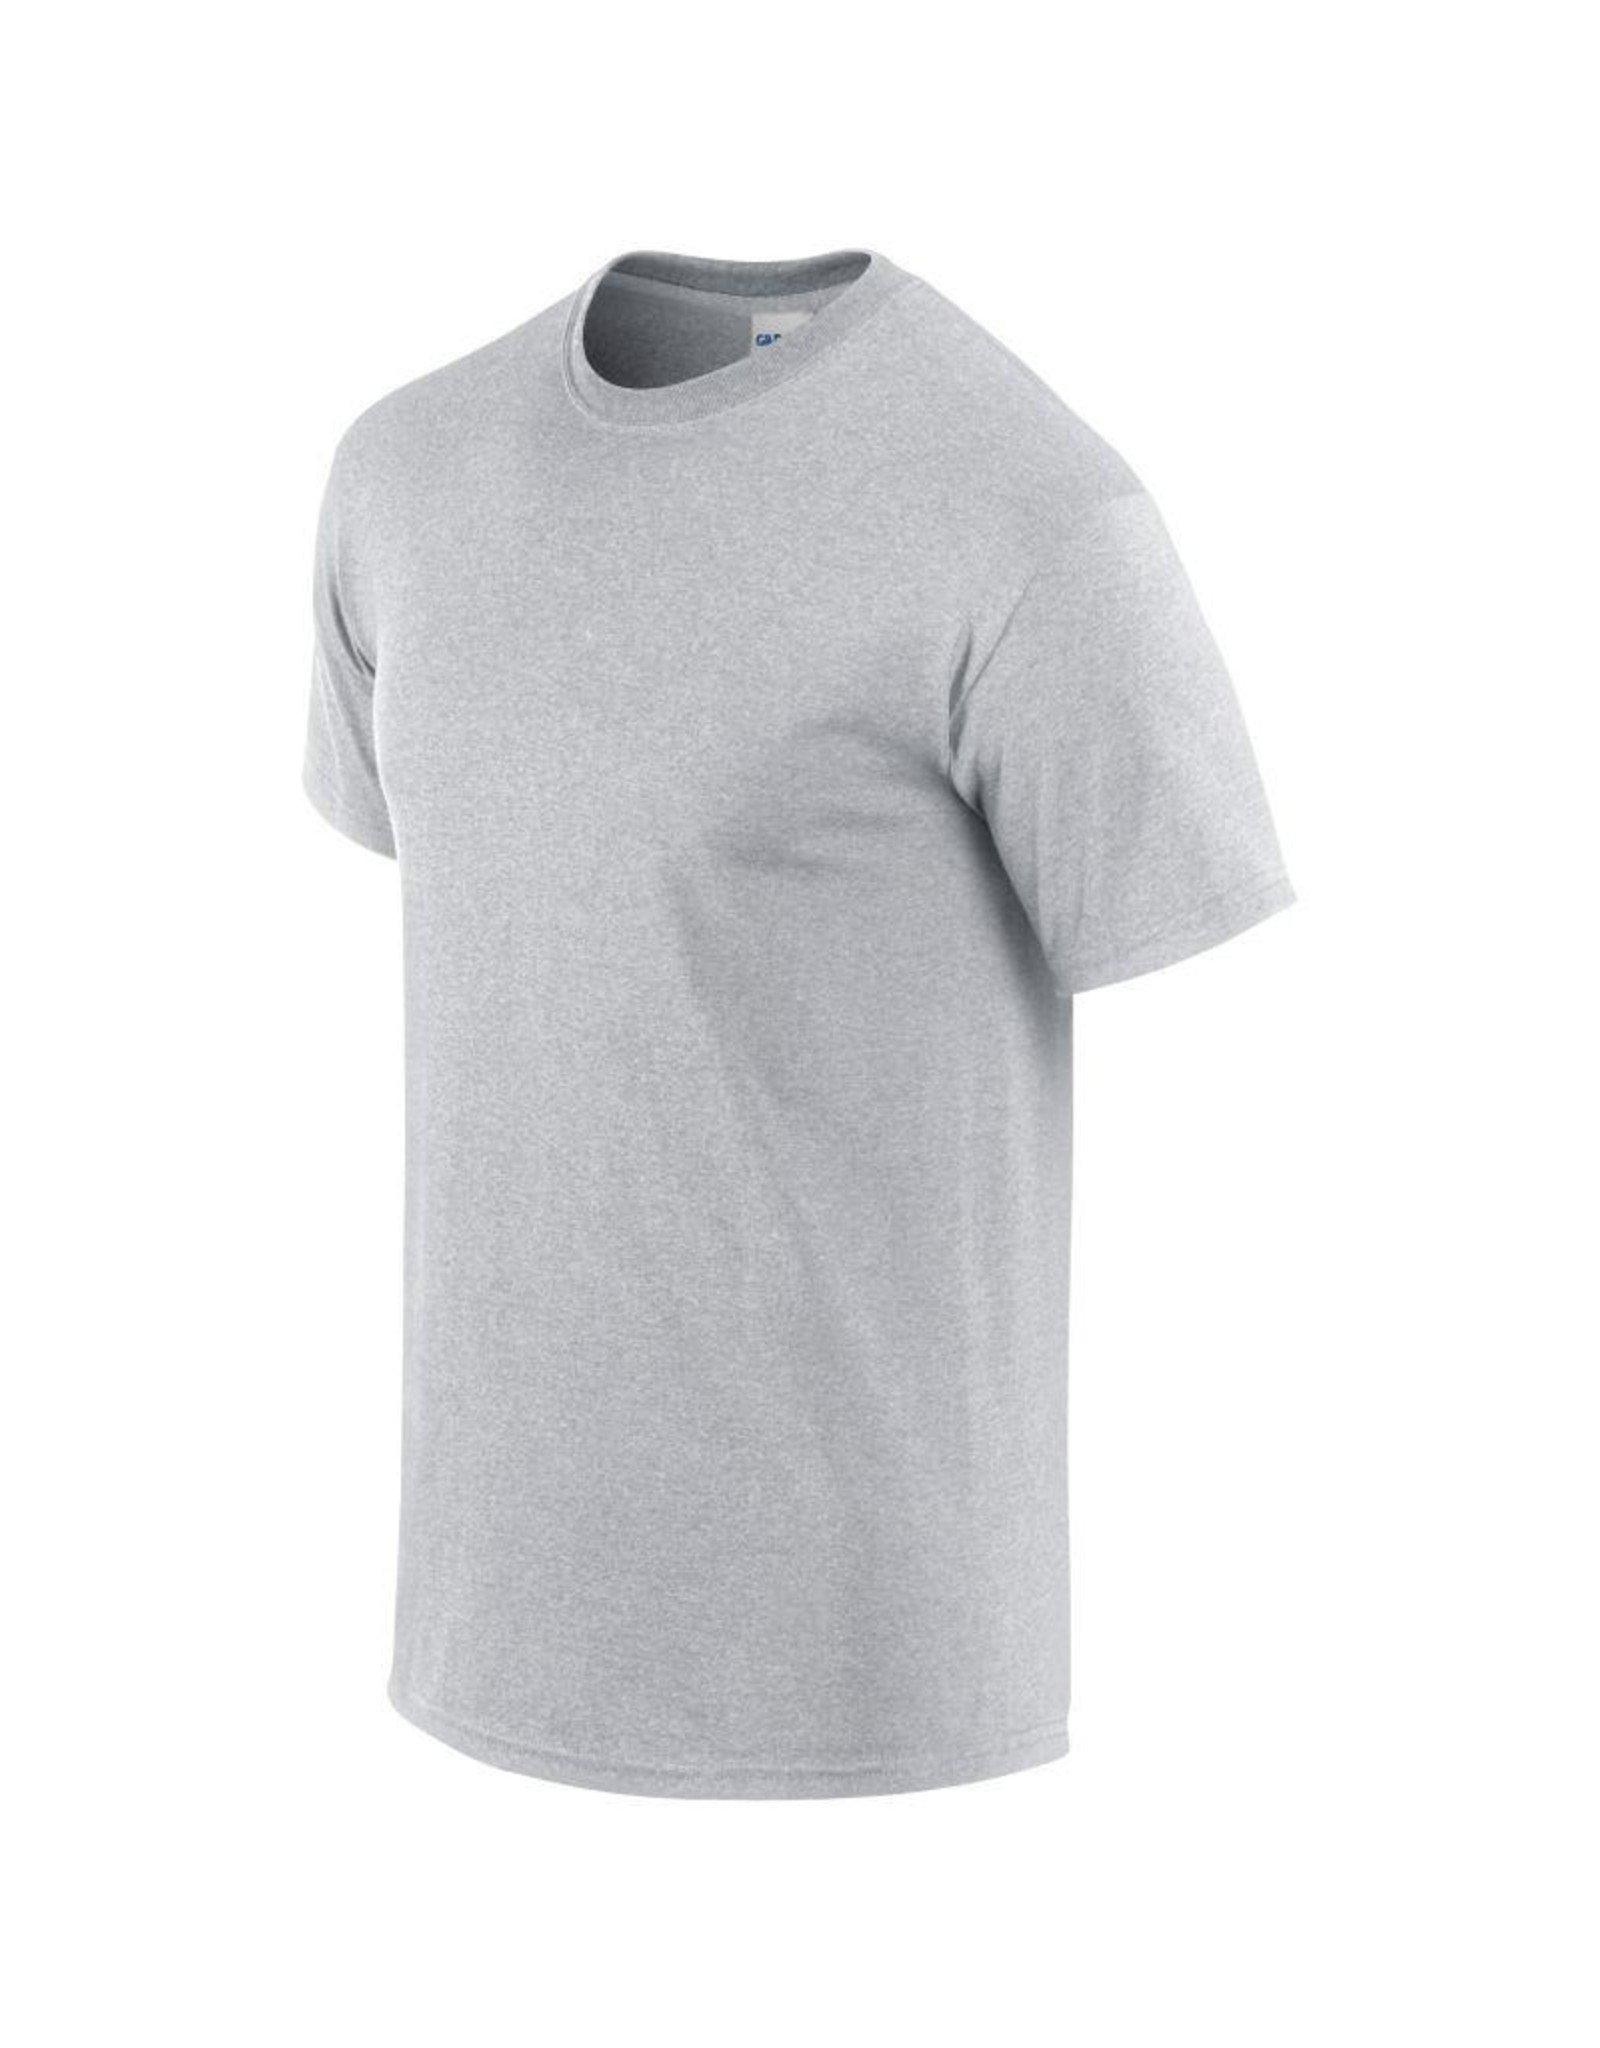 Gildan T-SHIRT heavy basic grijs